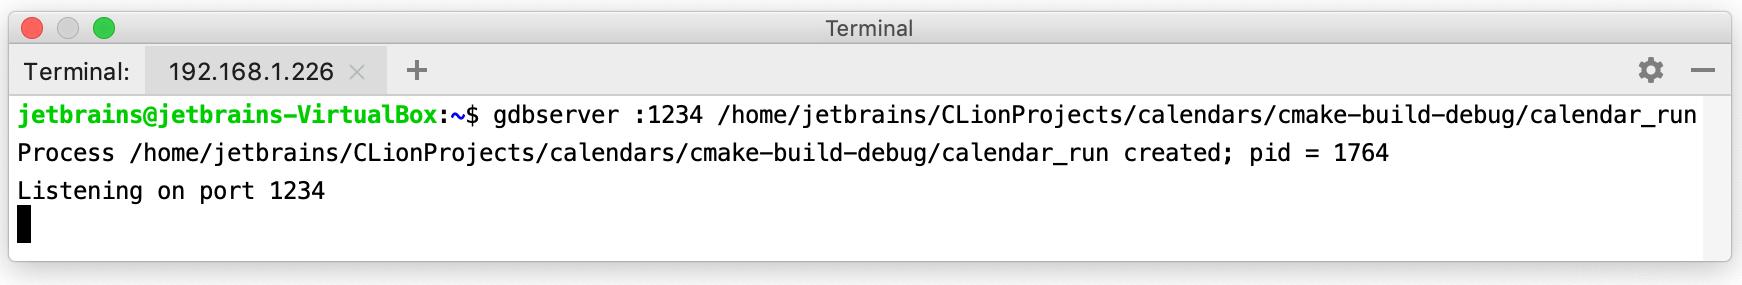 Remote Debug via GDB/gdbserver - Help | CLion